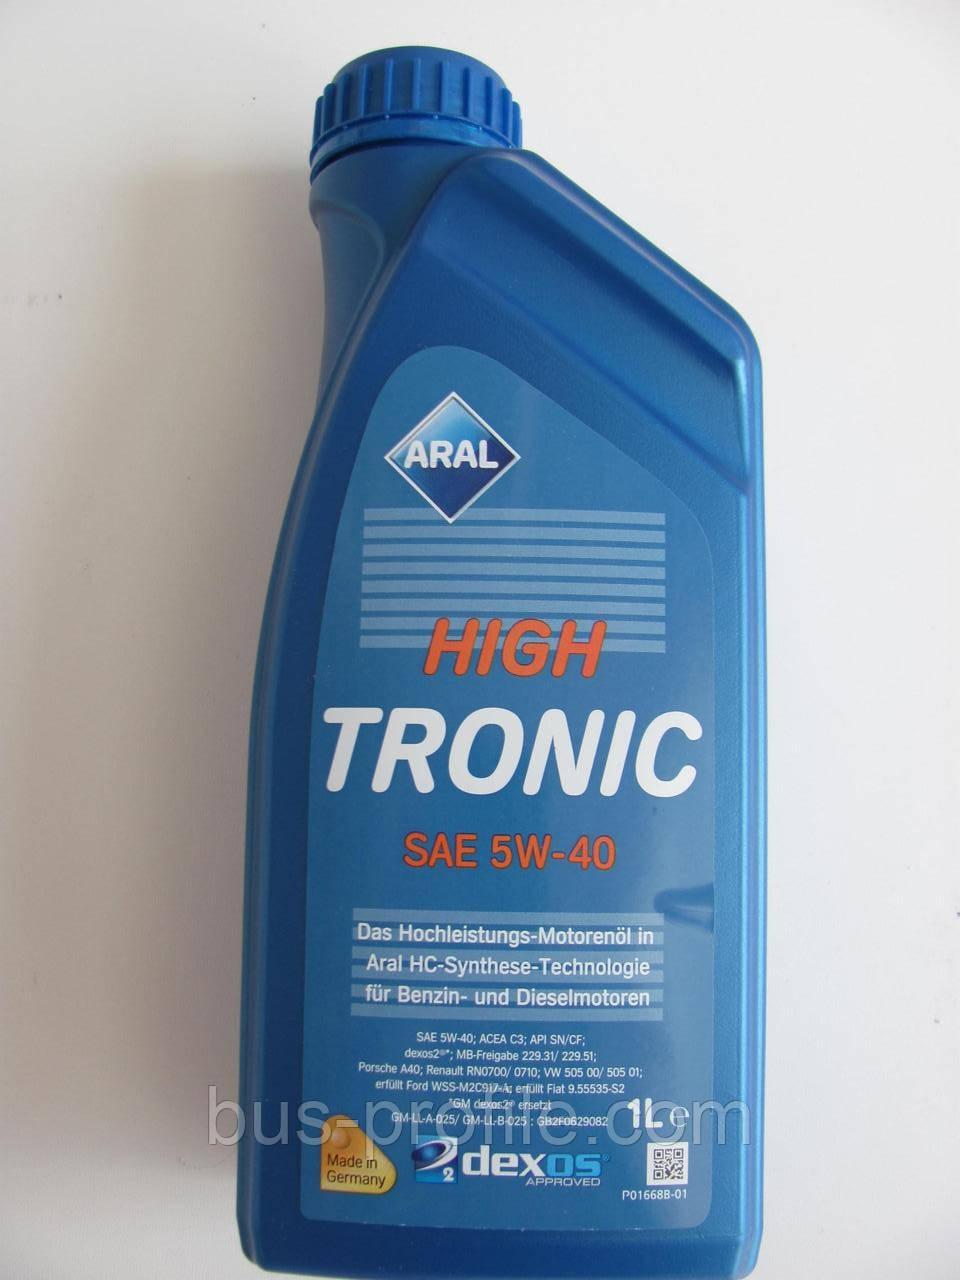 Масло 5W40 High Tronic (1L) (VW 502 00/505 00/505 01/MB 229.31/RN0700/GM dexos2) — ARAL — AR-1505B4